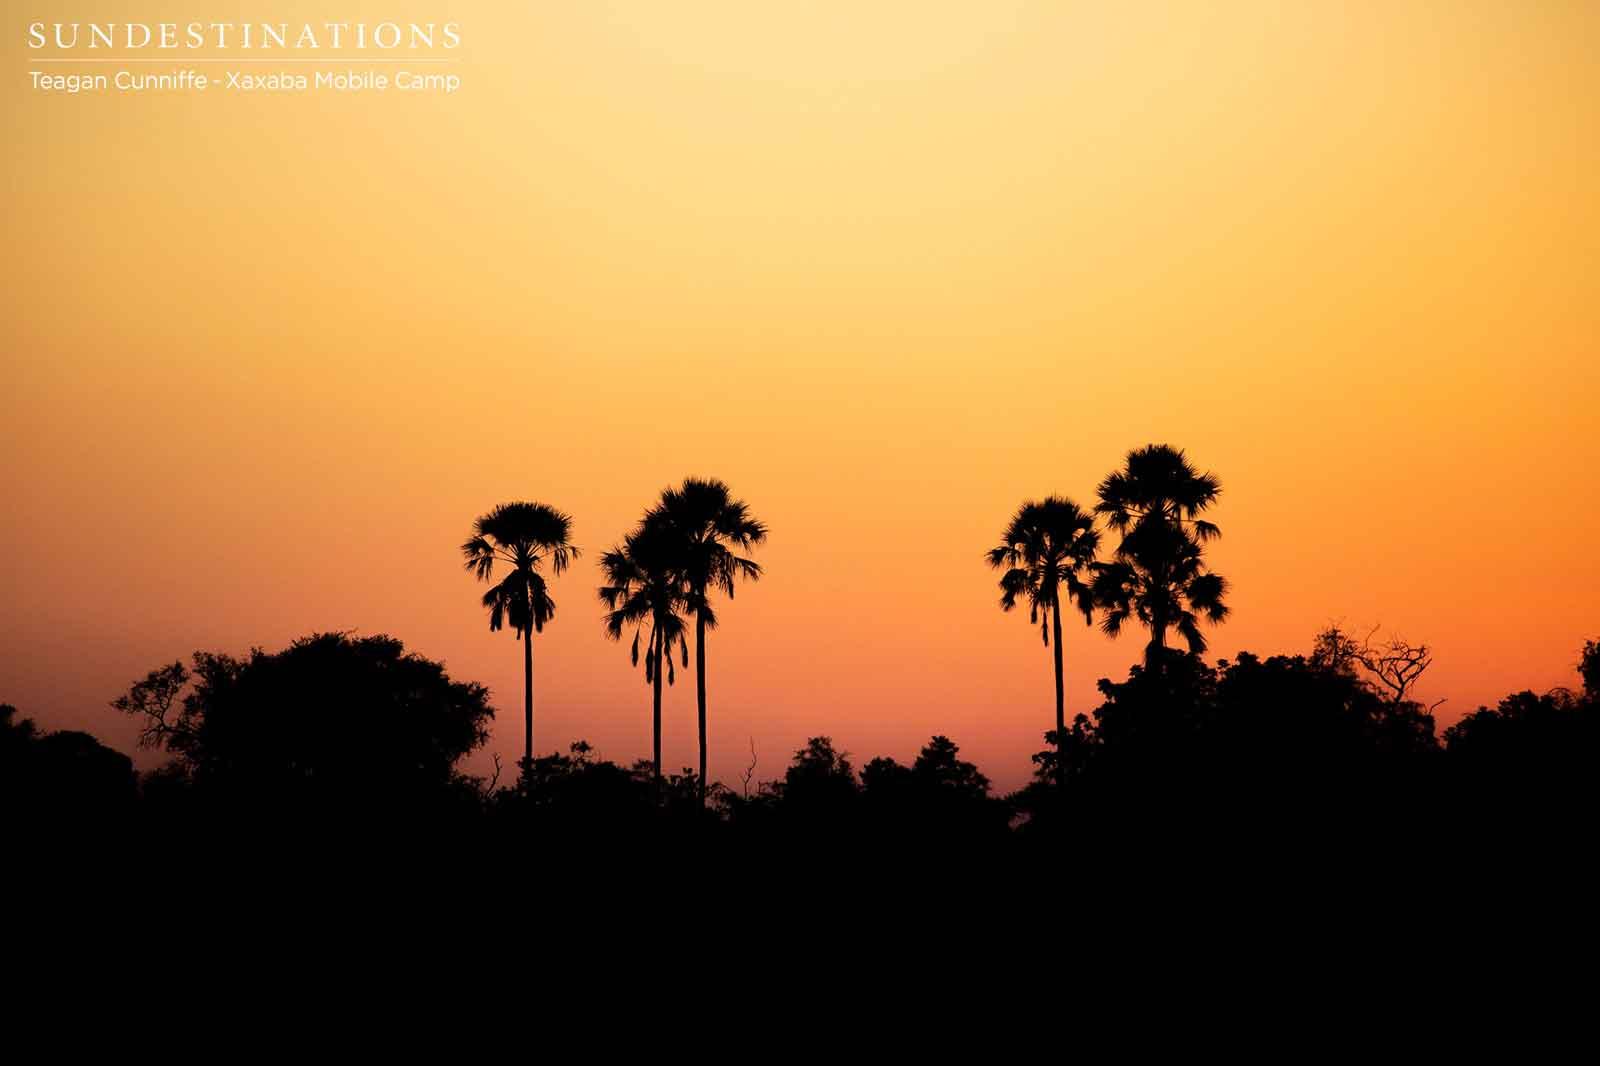 Sunsets at Xaxaba